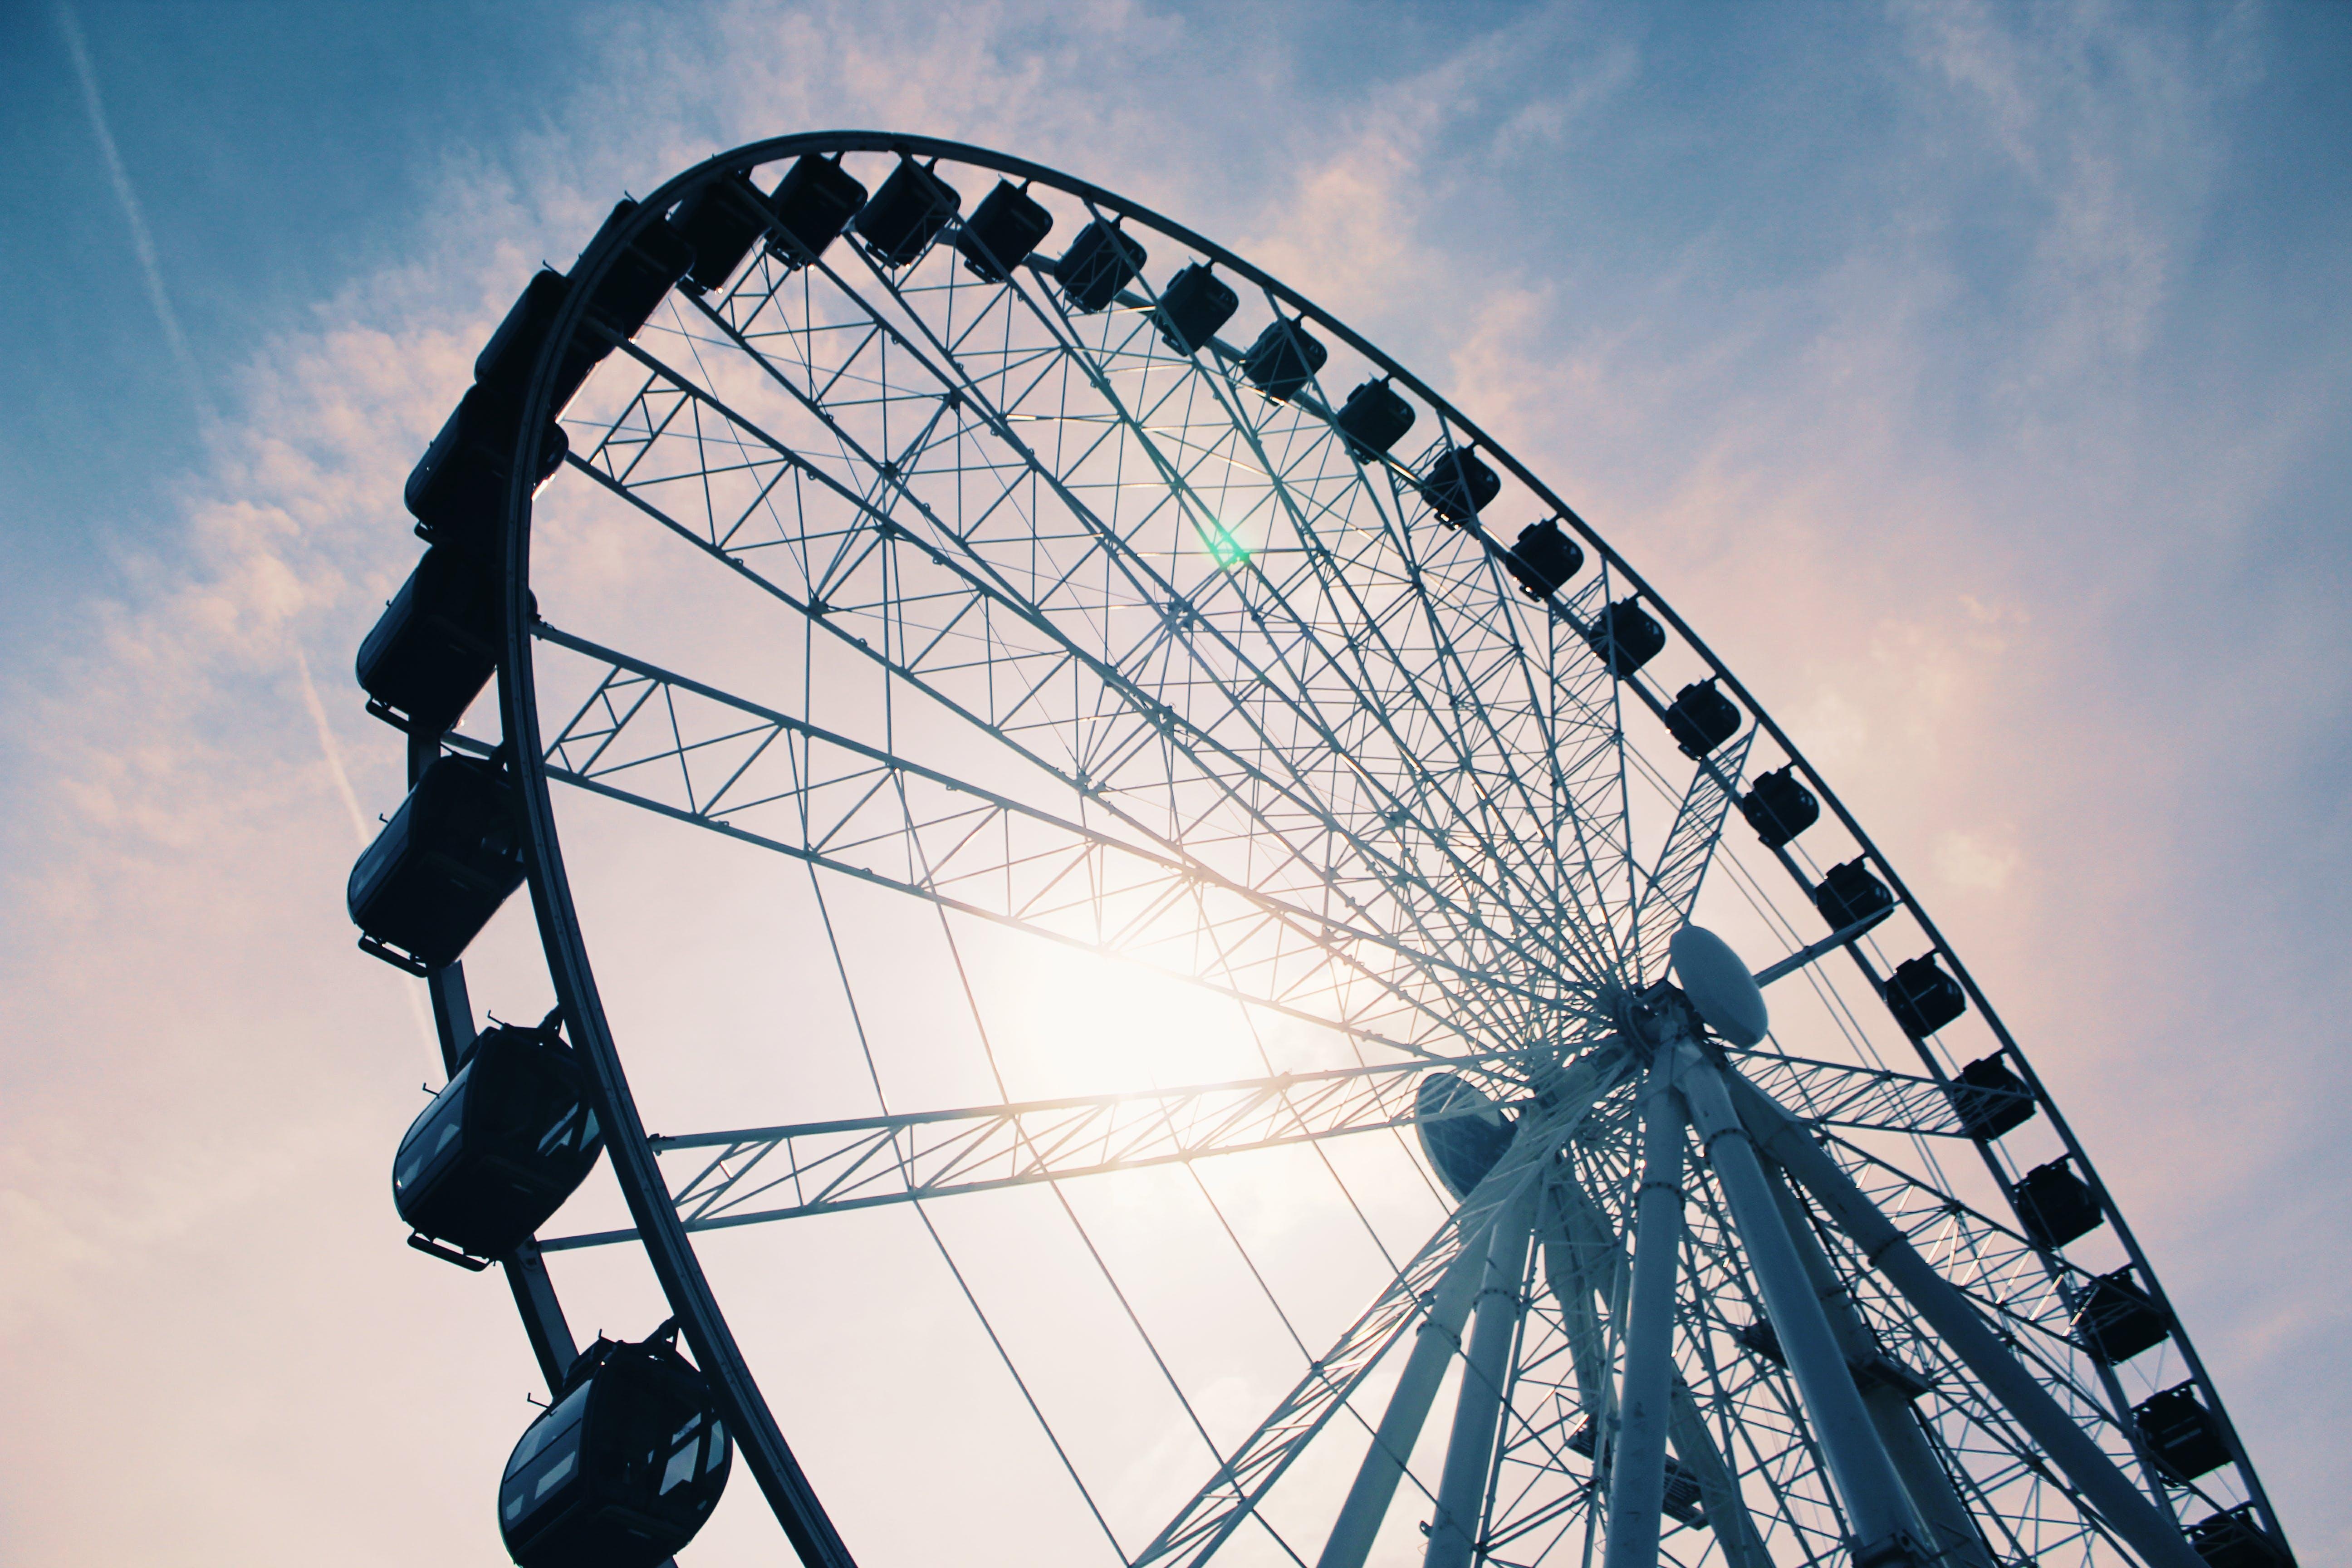 White Ferris Wheel Under Cloudy Sky